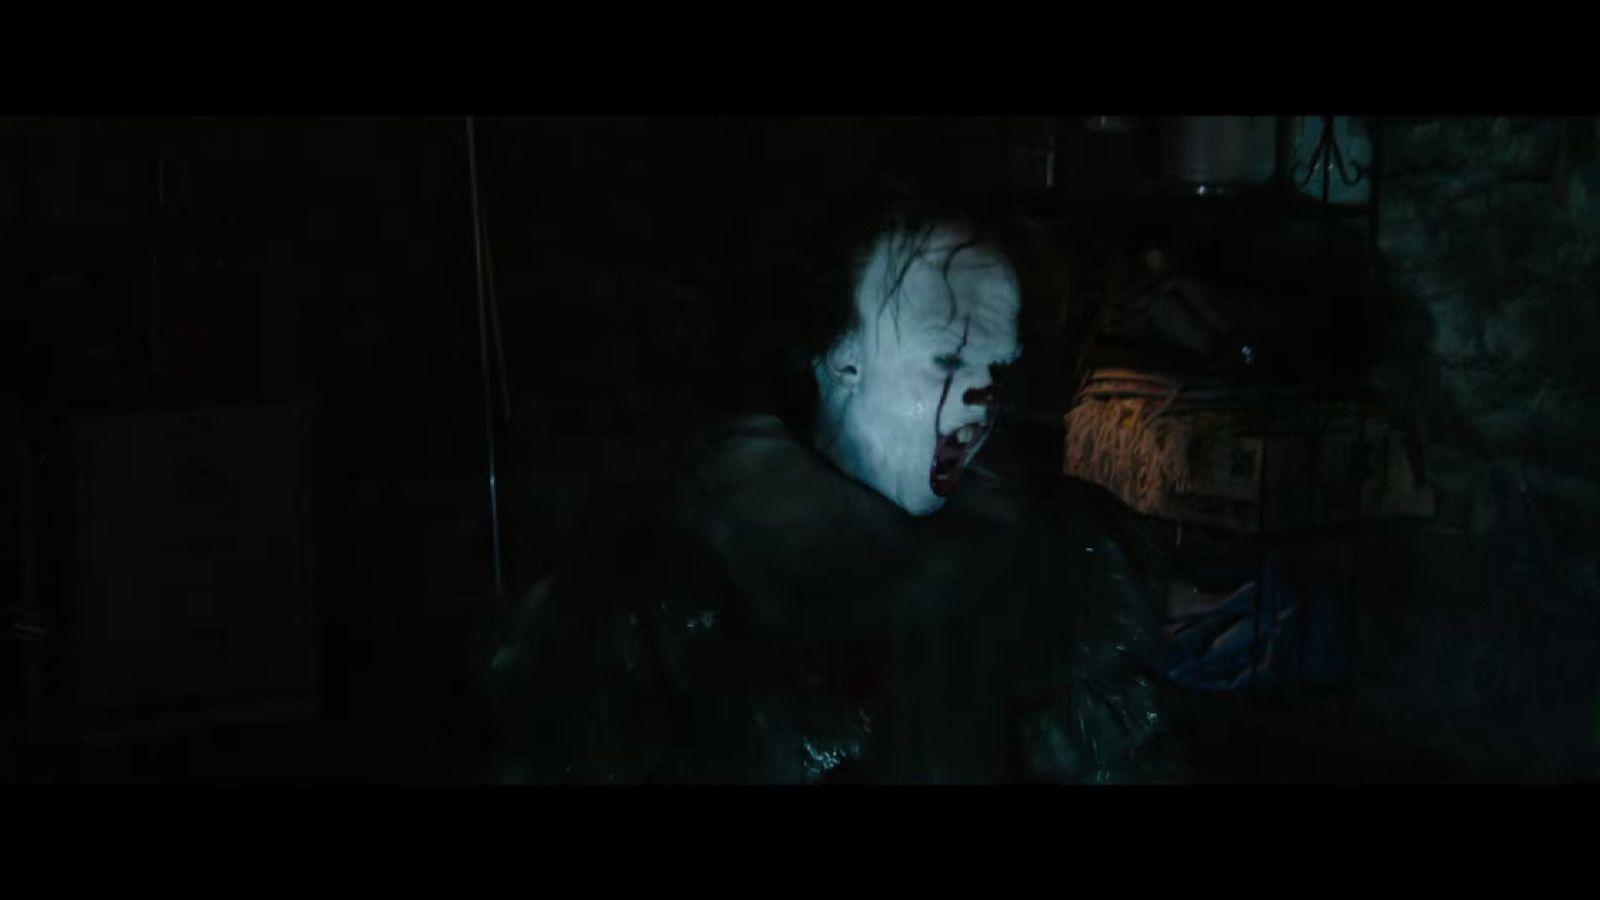 Wallpaper It Clown Bill Skarsgard Horror 2017 Hd: Trailer For Stephen King's It Slammed As 'disgusting' By